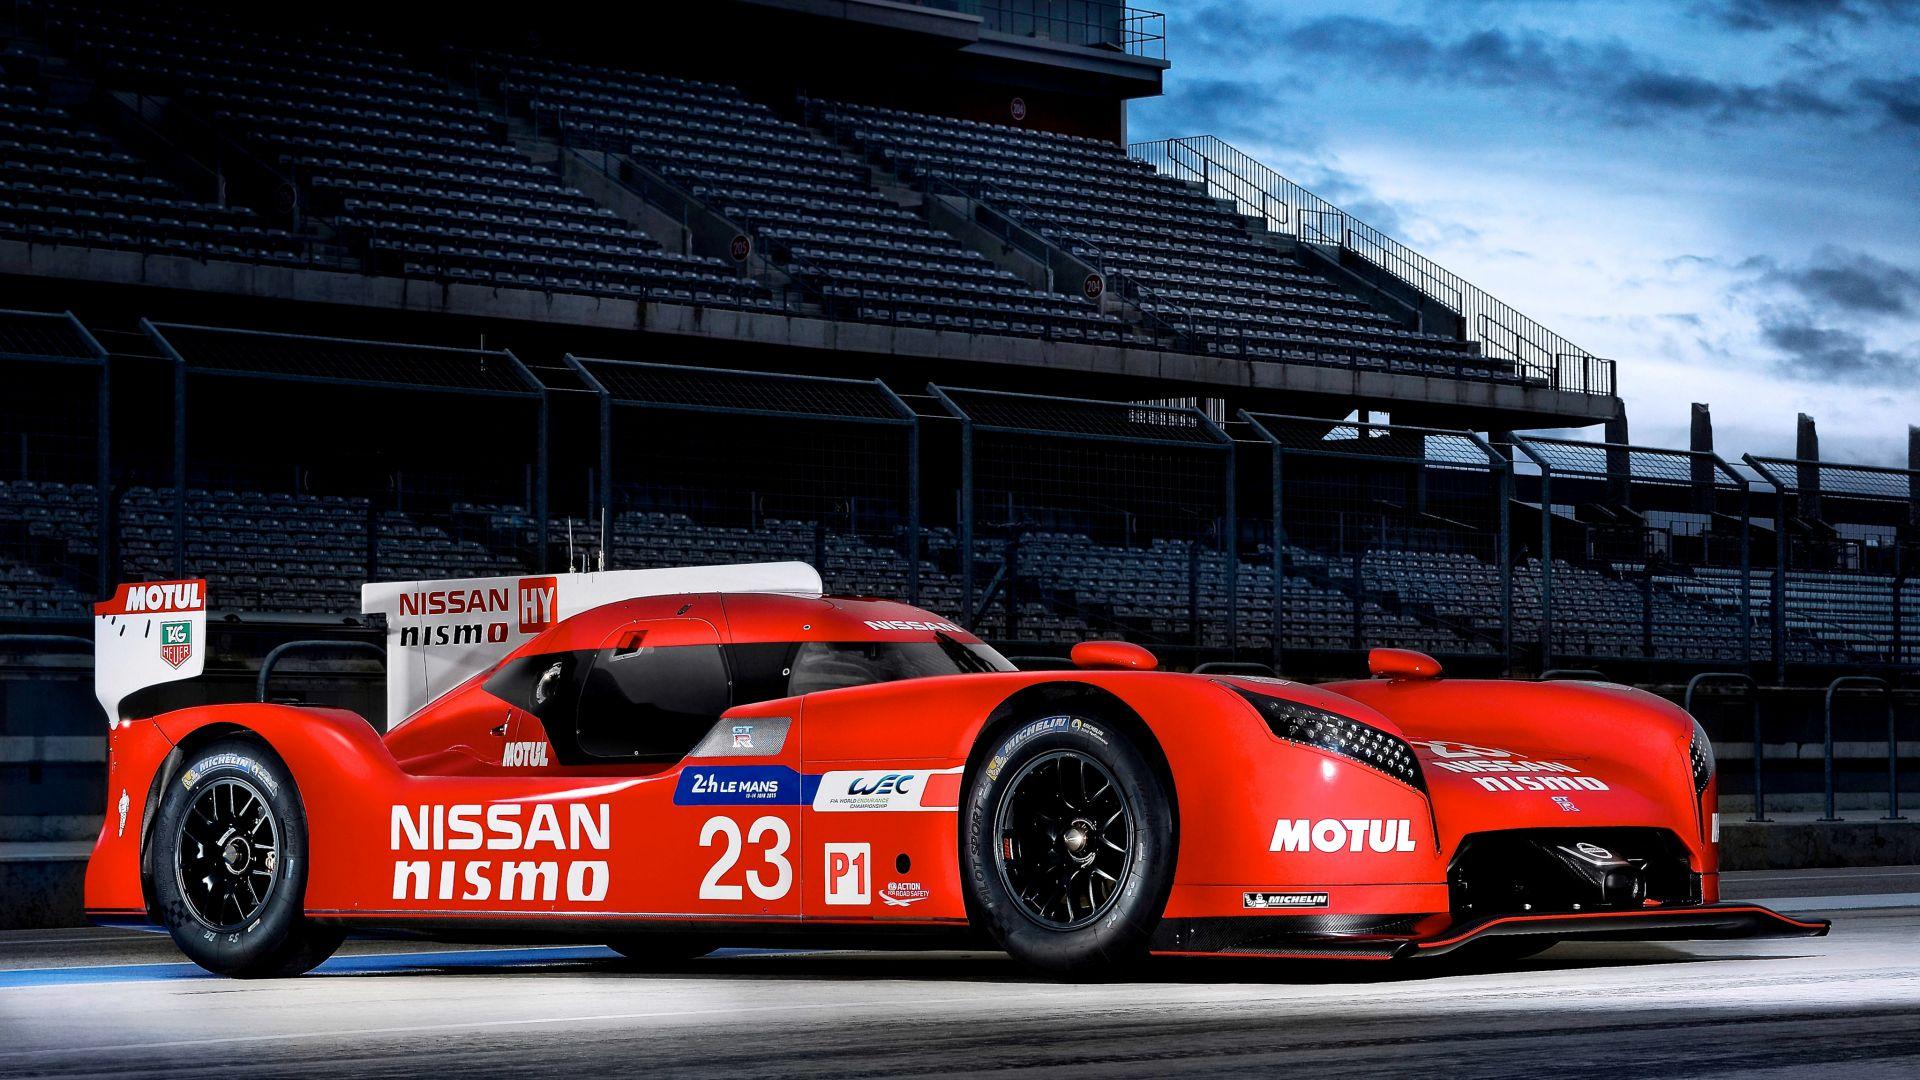 Wallpaper Nissan GT-R LM Nismo Car